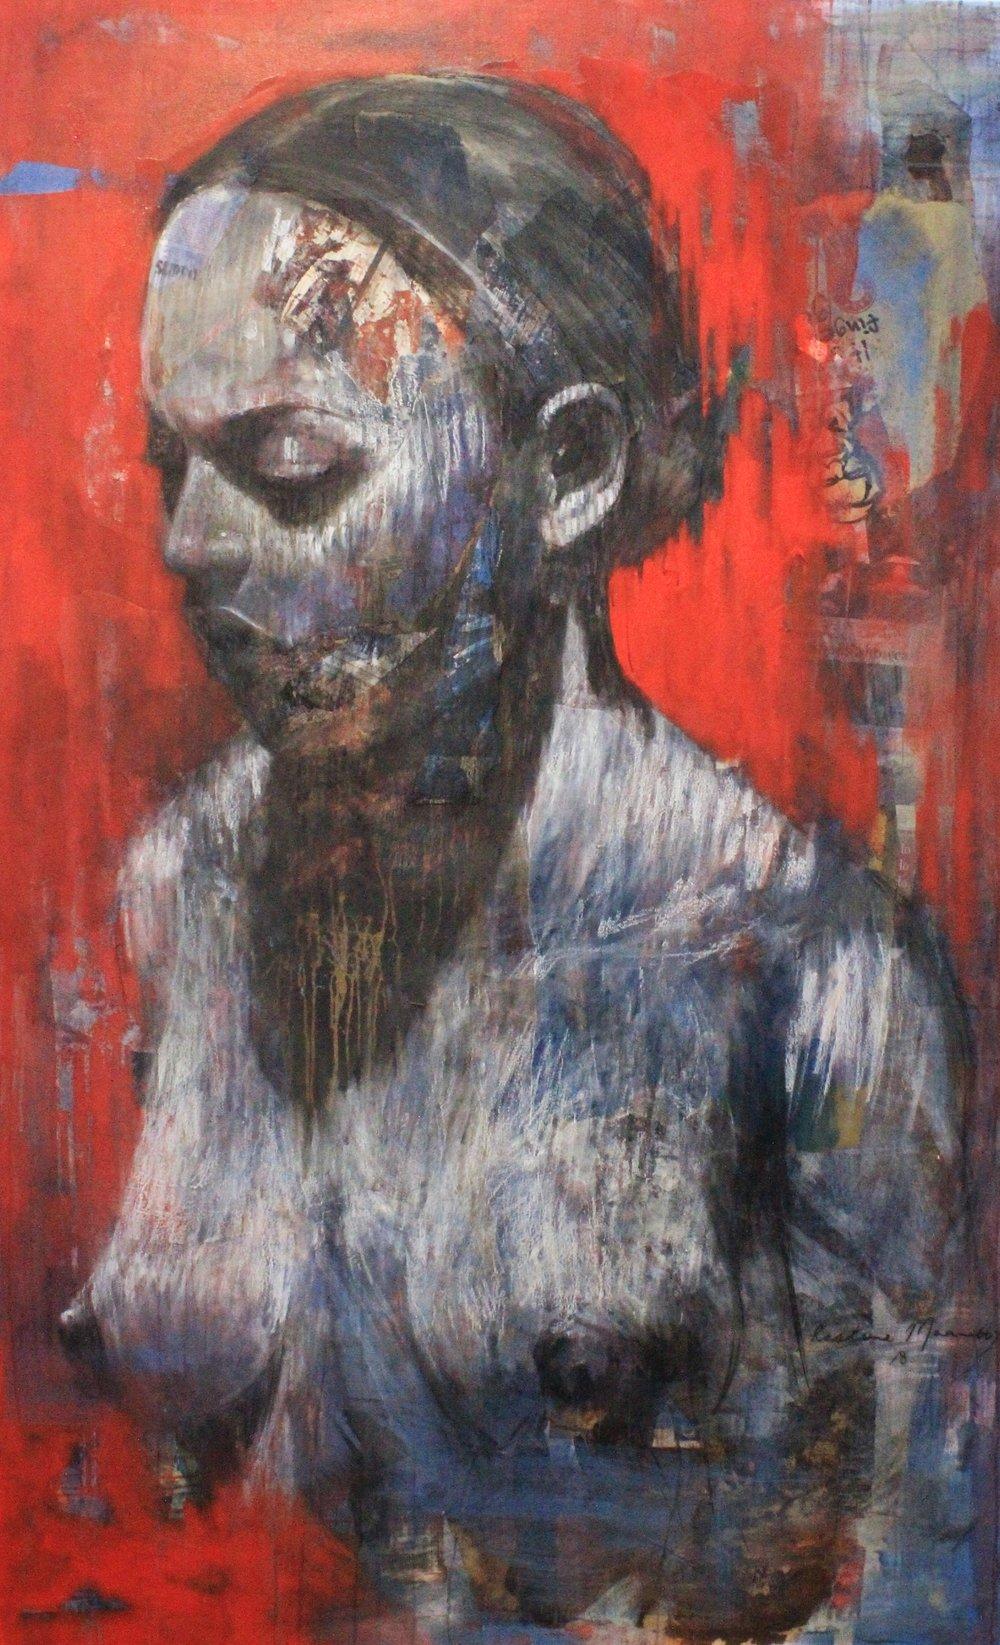 ' Kusalahigwa '   Restone Maambo  Collage and Mixed Media on Canvas  2090 x 1500 x 50 mm  2018